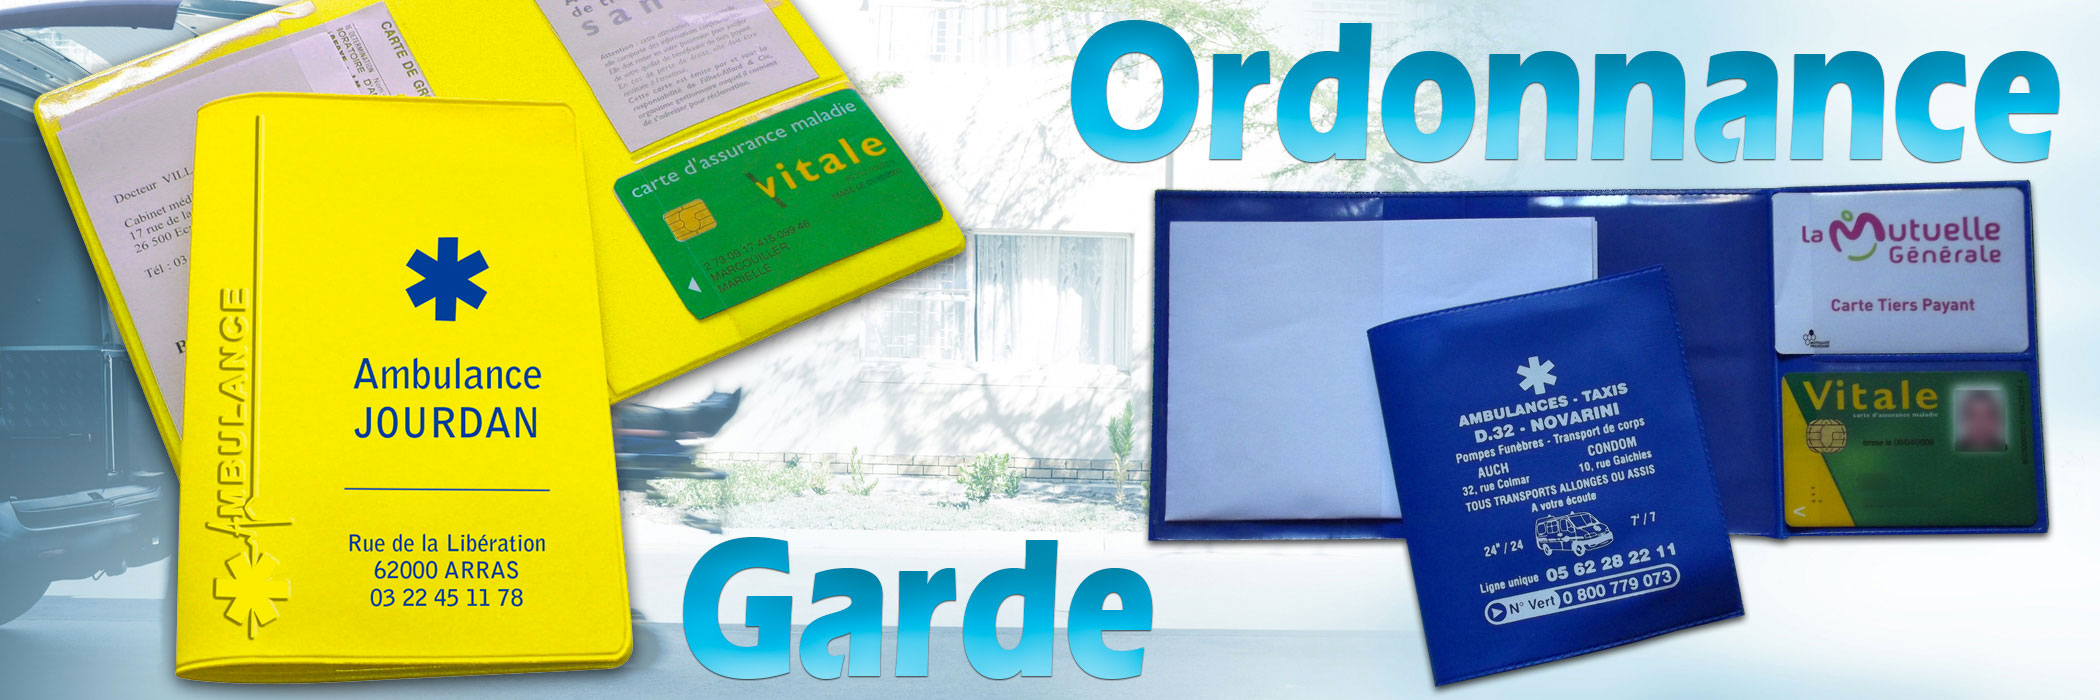 Garde ordonnances et porte-carte vitale